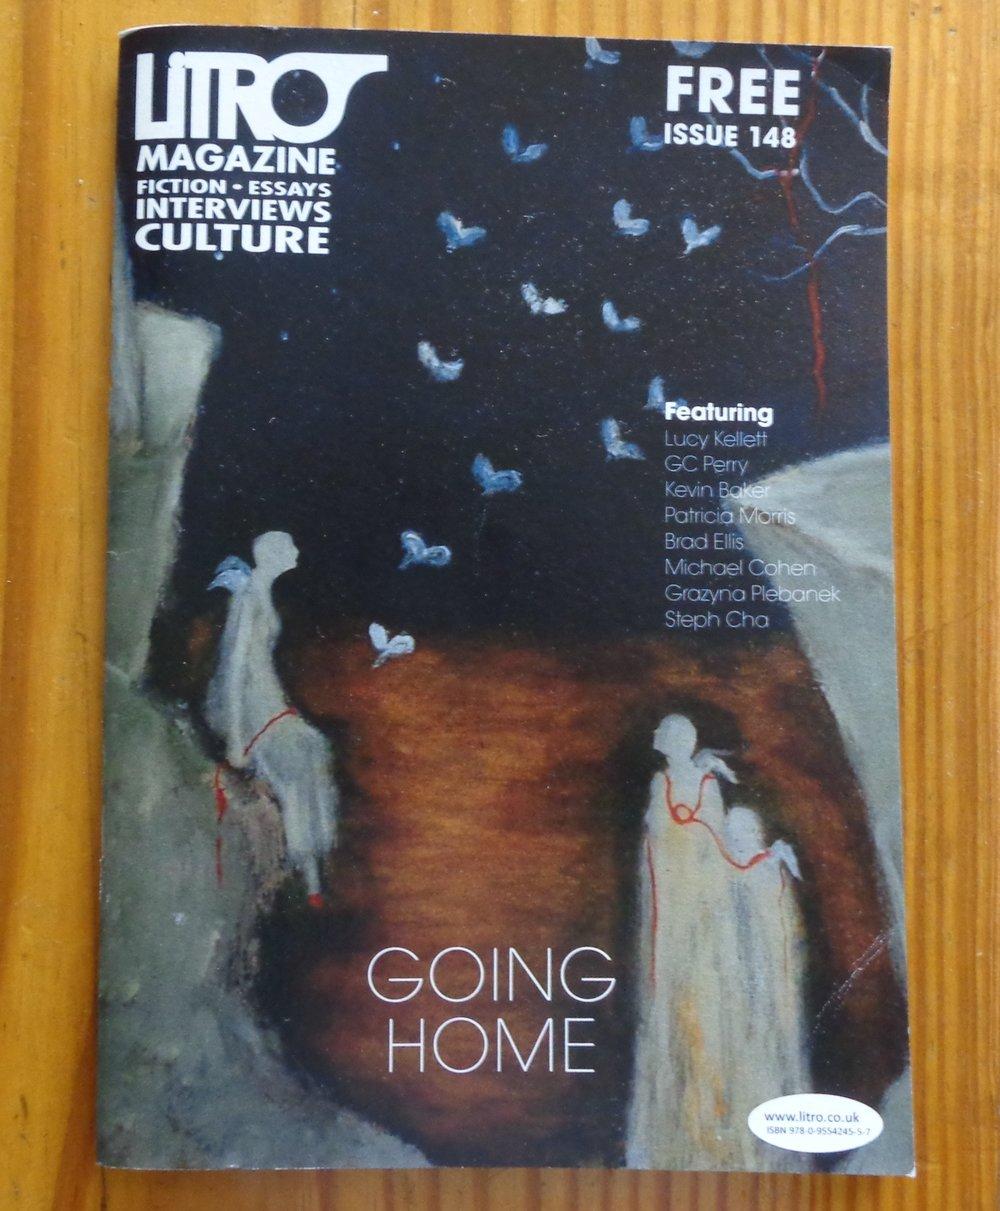 Litro Magazine, cover art